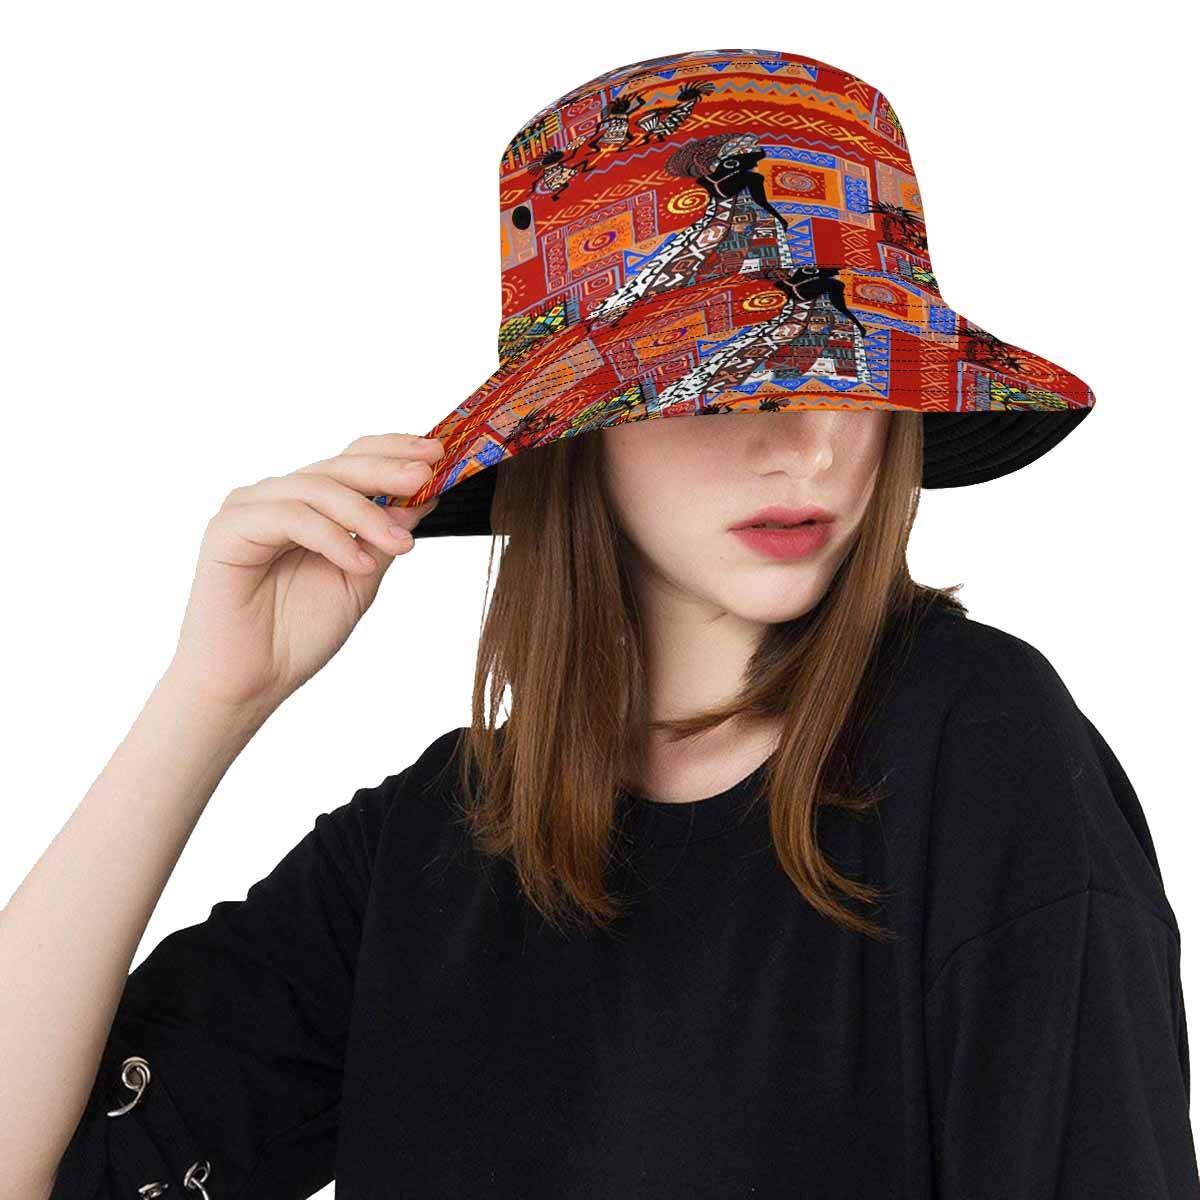 8bf6eebf6fa82 INTERESTPRINT African Print Pattern Bucket Hats Outdoor Sun Hats at Amazon  Women s Clothing store